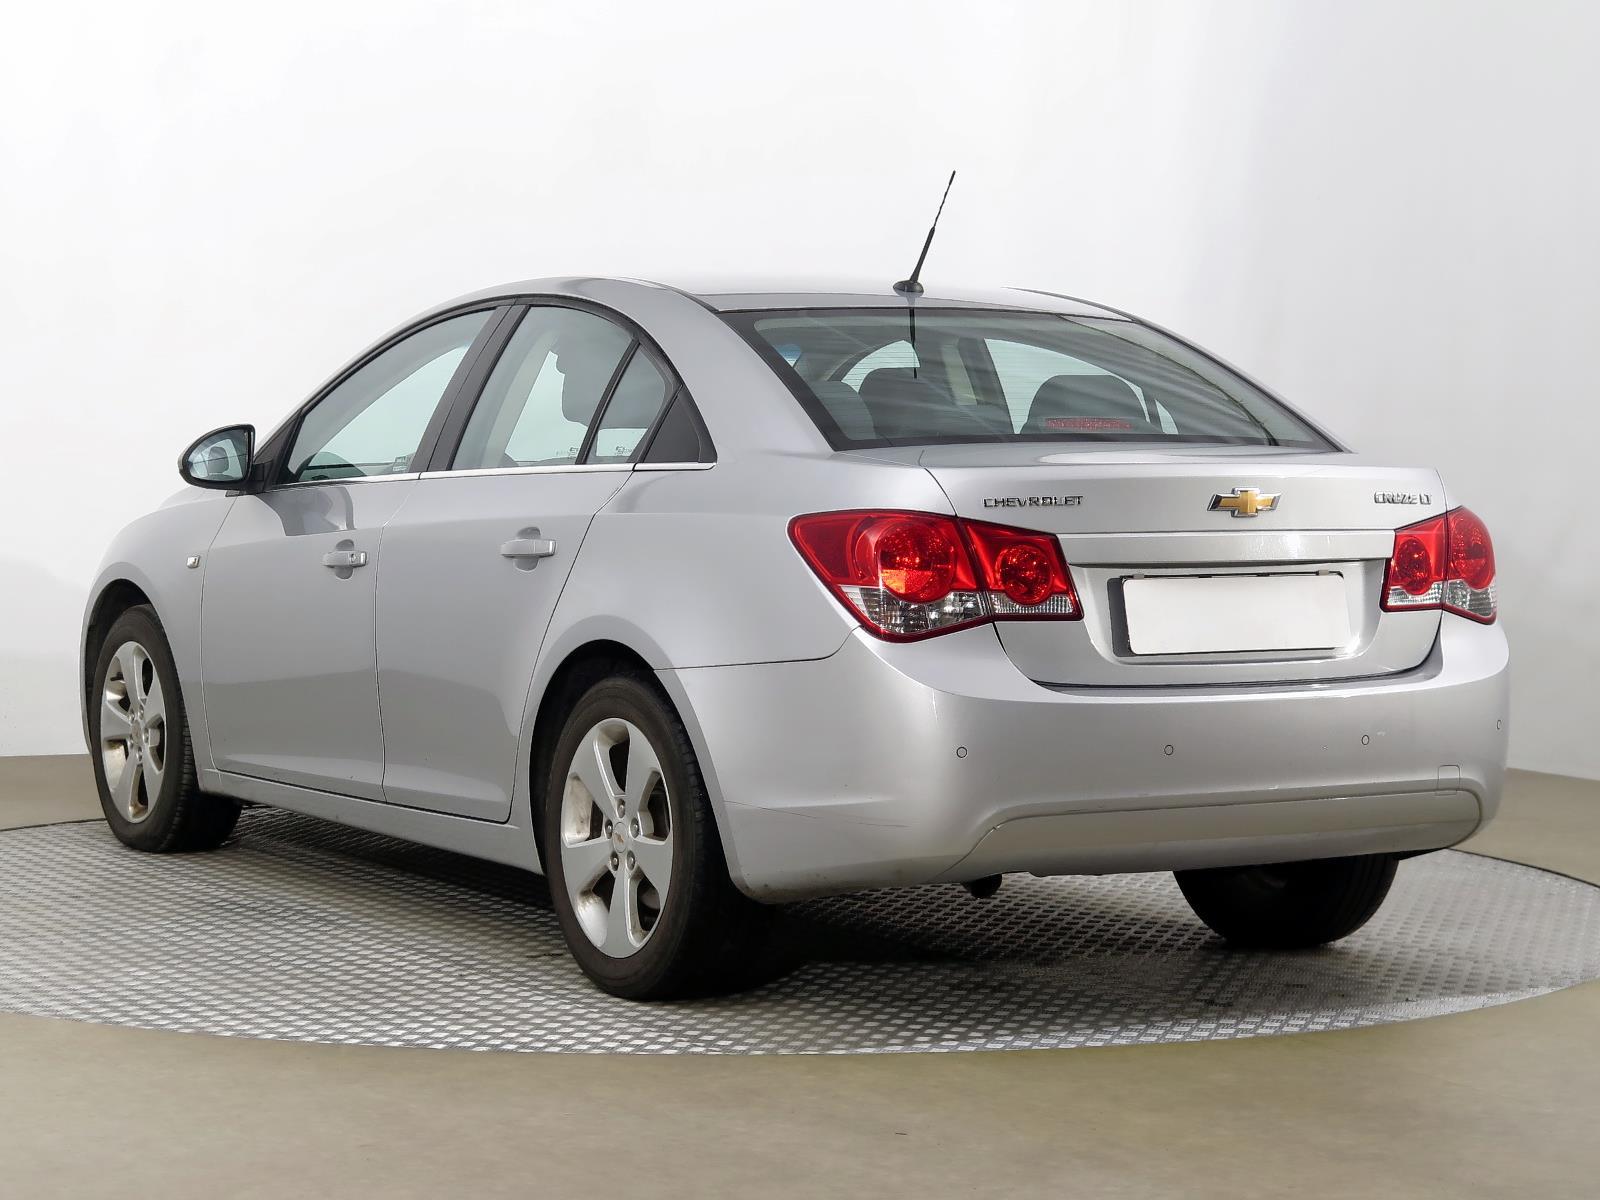 Gebrauchte Chevrolet Cruze 2010 2 0 Vcdi 102381km Abs 2010 Aaa Auto Export